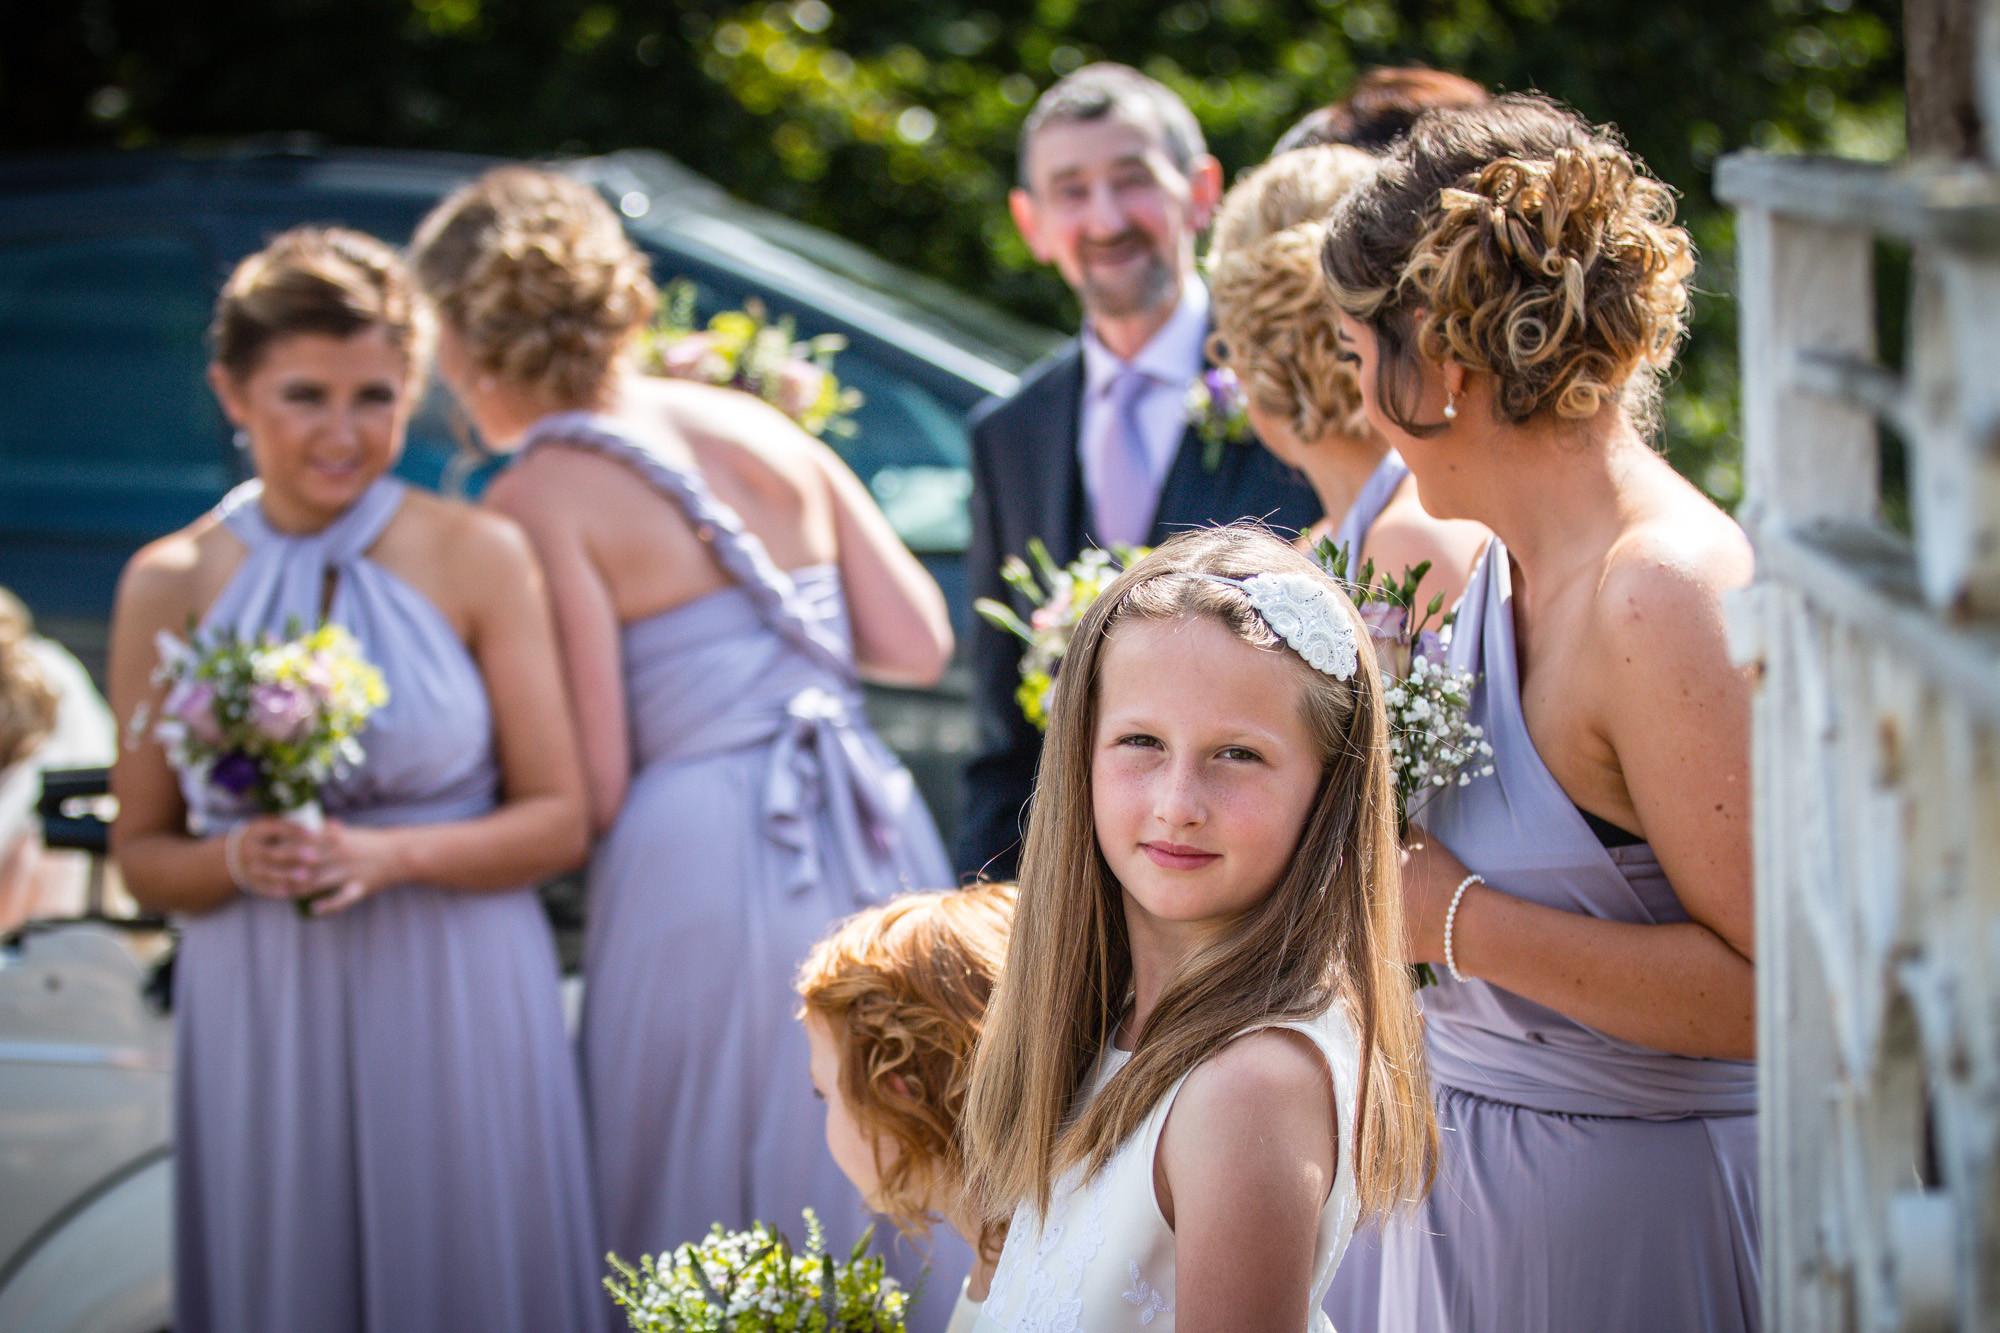 Orla & Niall - Slieve Donard Hotel. Wedding photographer Andrew McKenna, Newcastle. County Down.